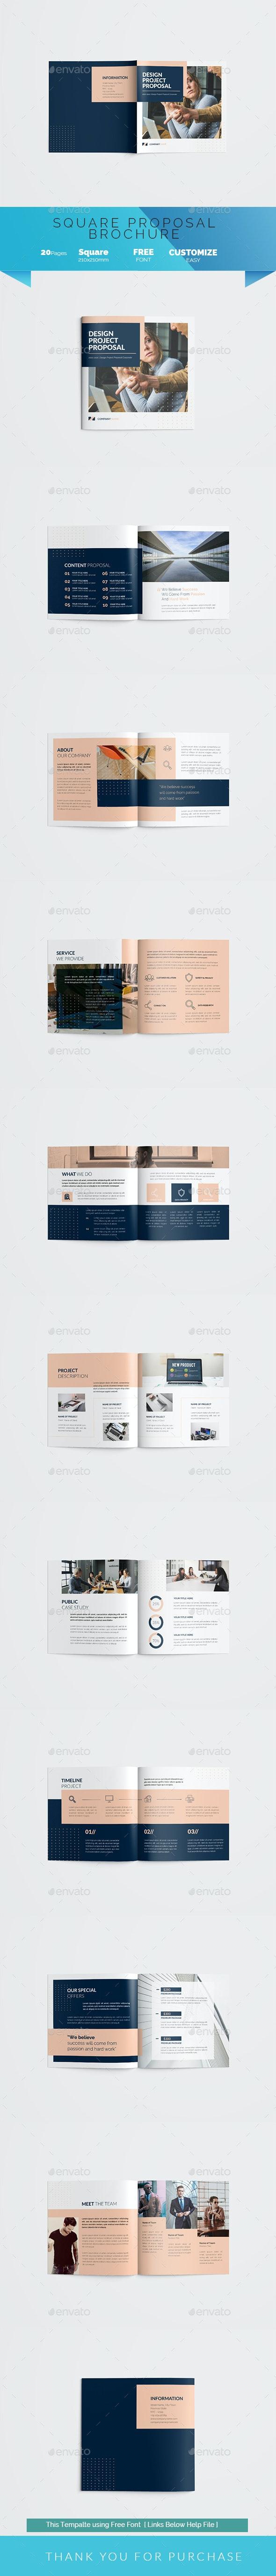 Square Proposal Brochure - Corporate Brochures